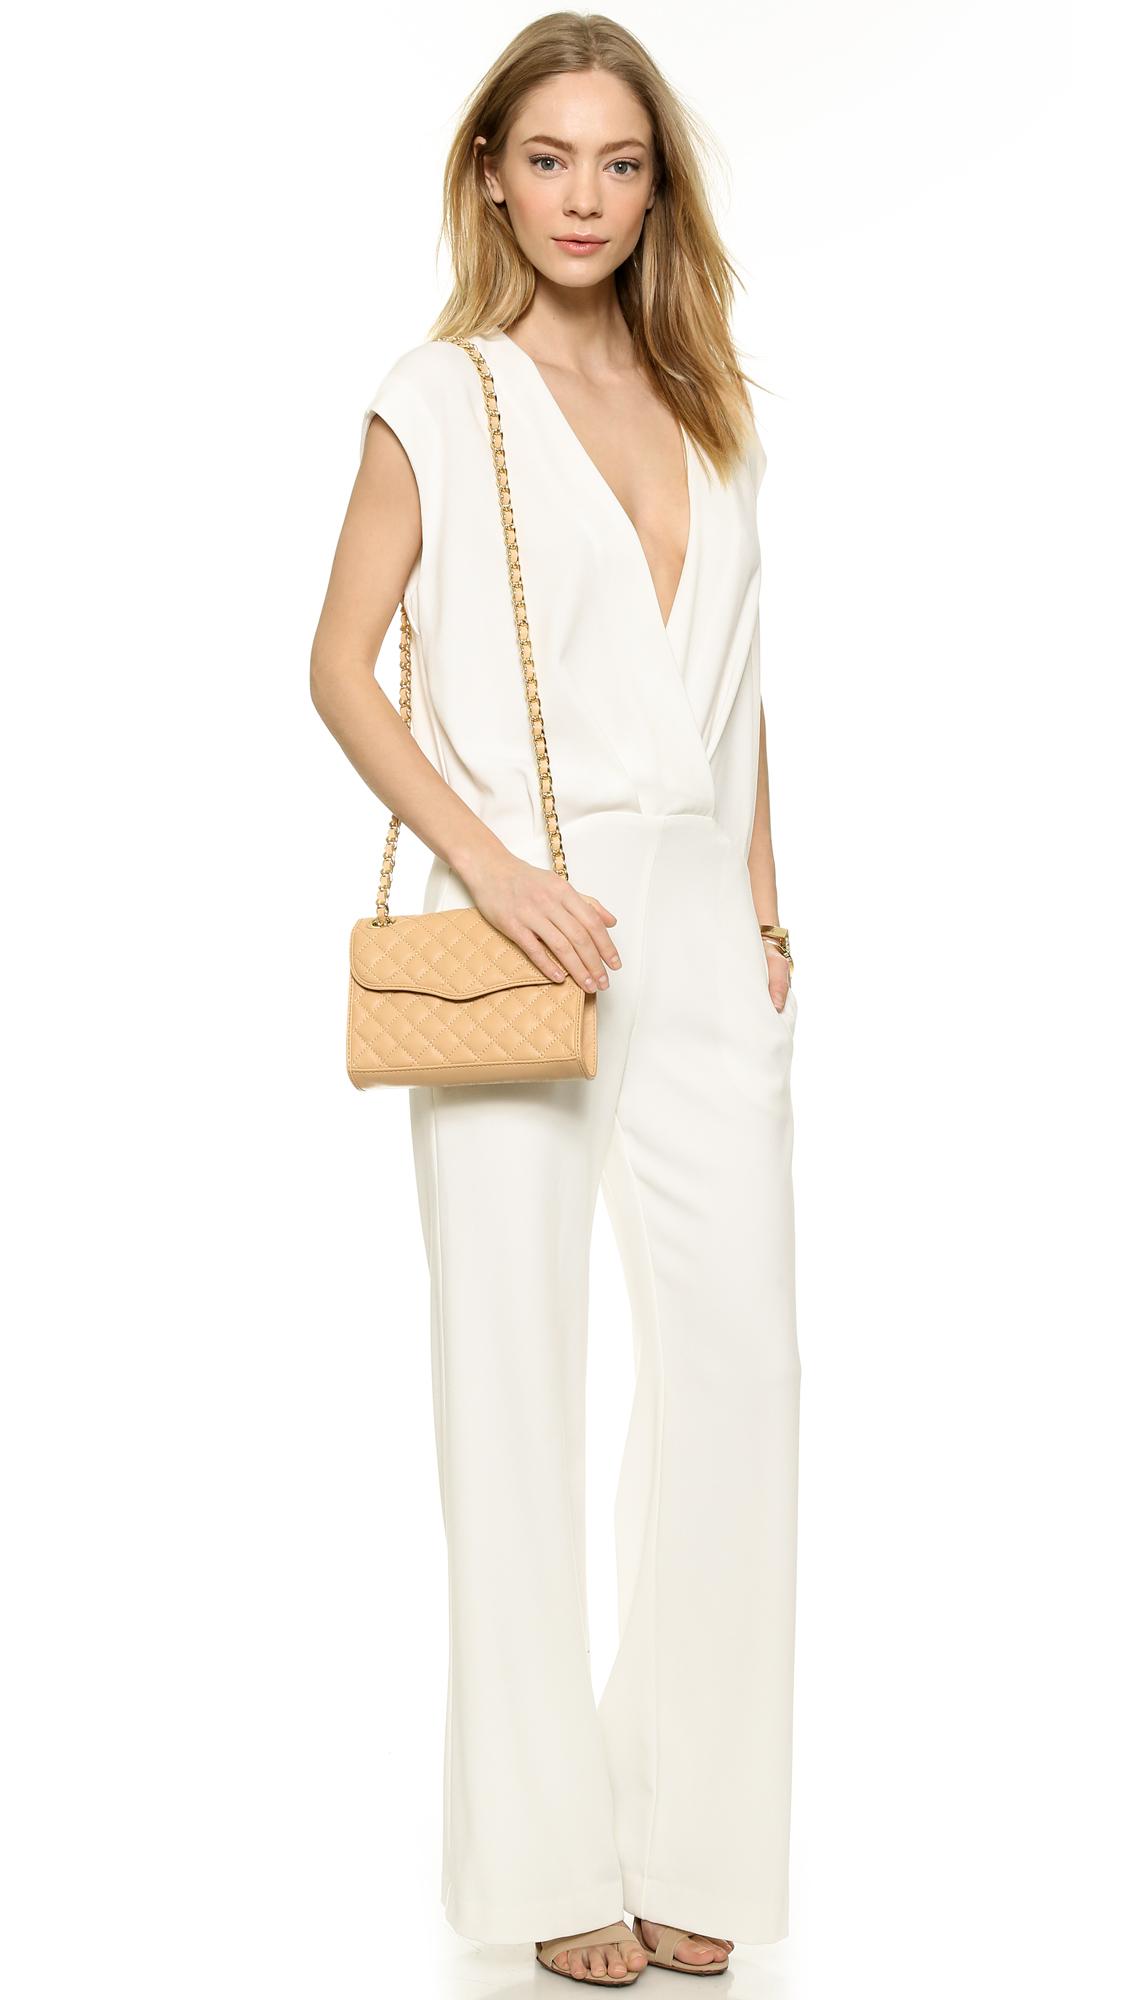 body rebecca deal alert bag quilt mini size quilted black hand minkoff affair one shop cross